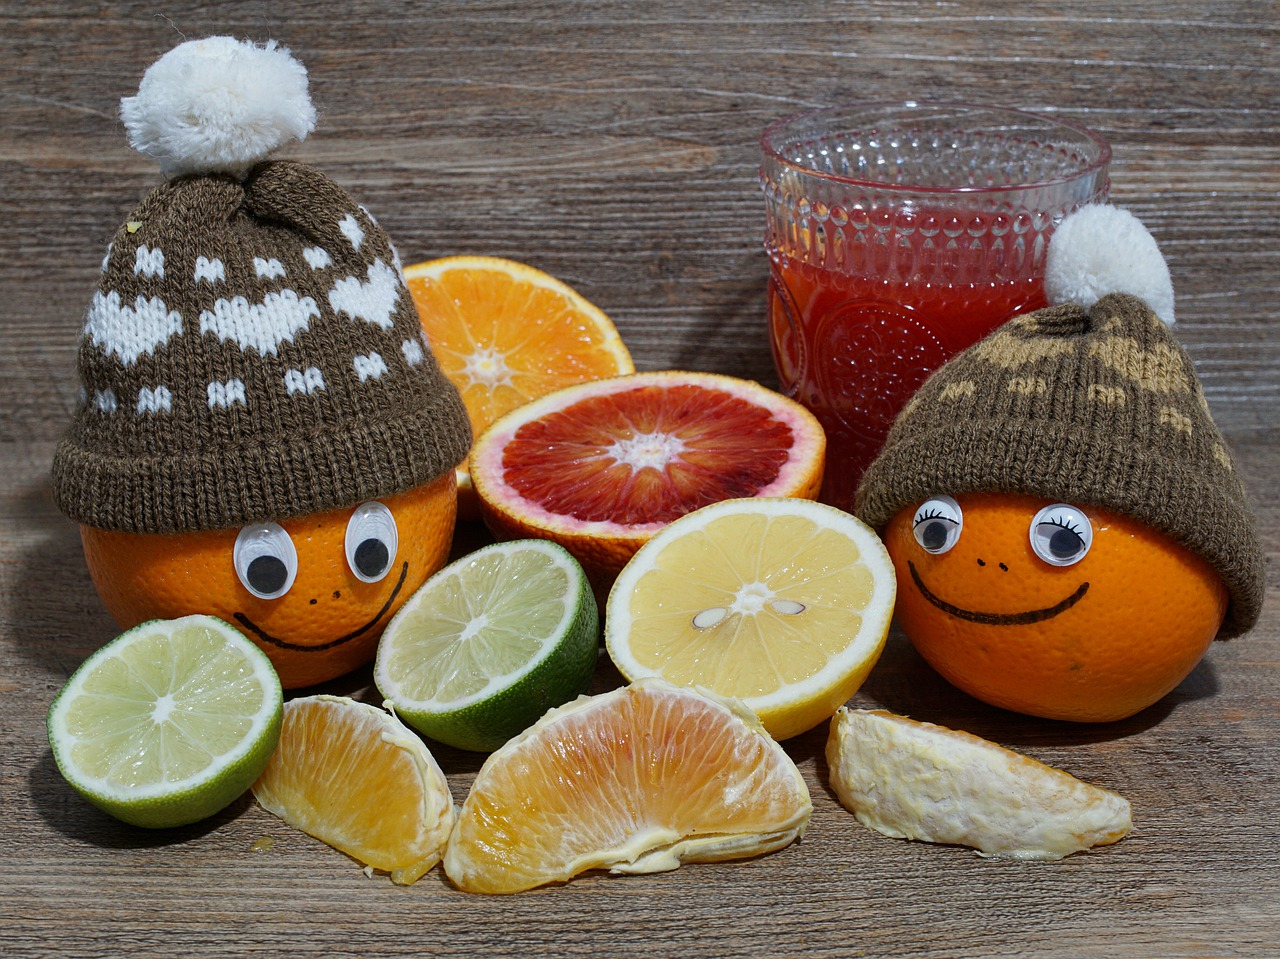 А50 картинки, апельсины веселые картинки